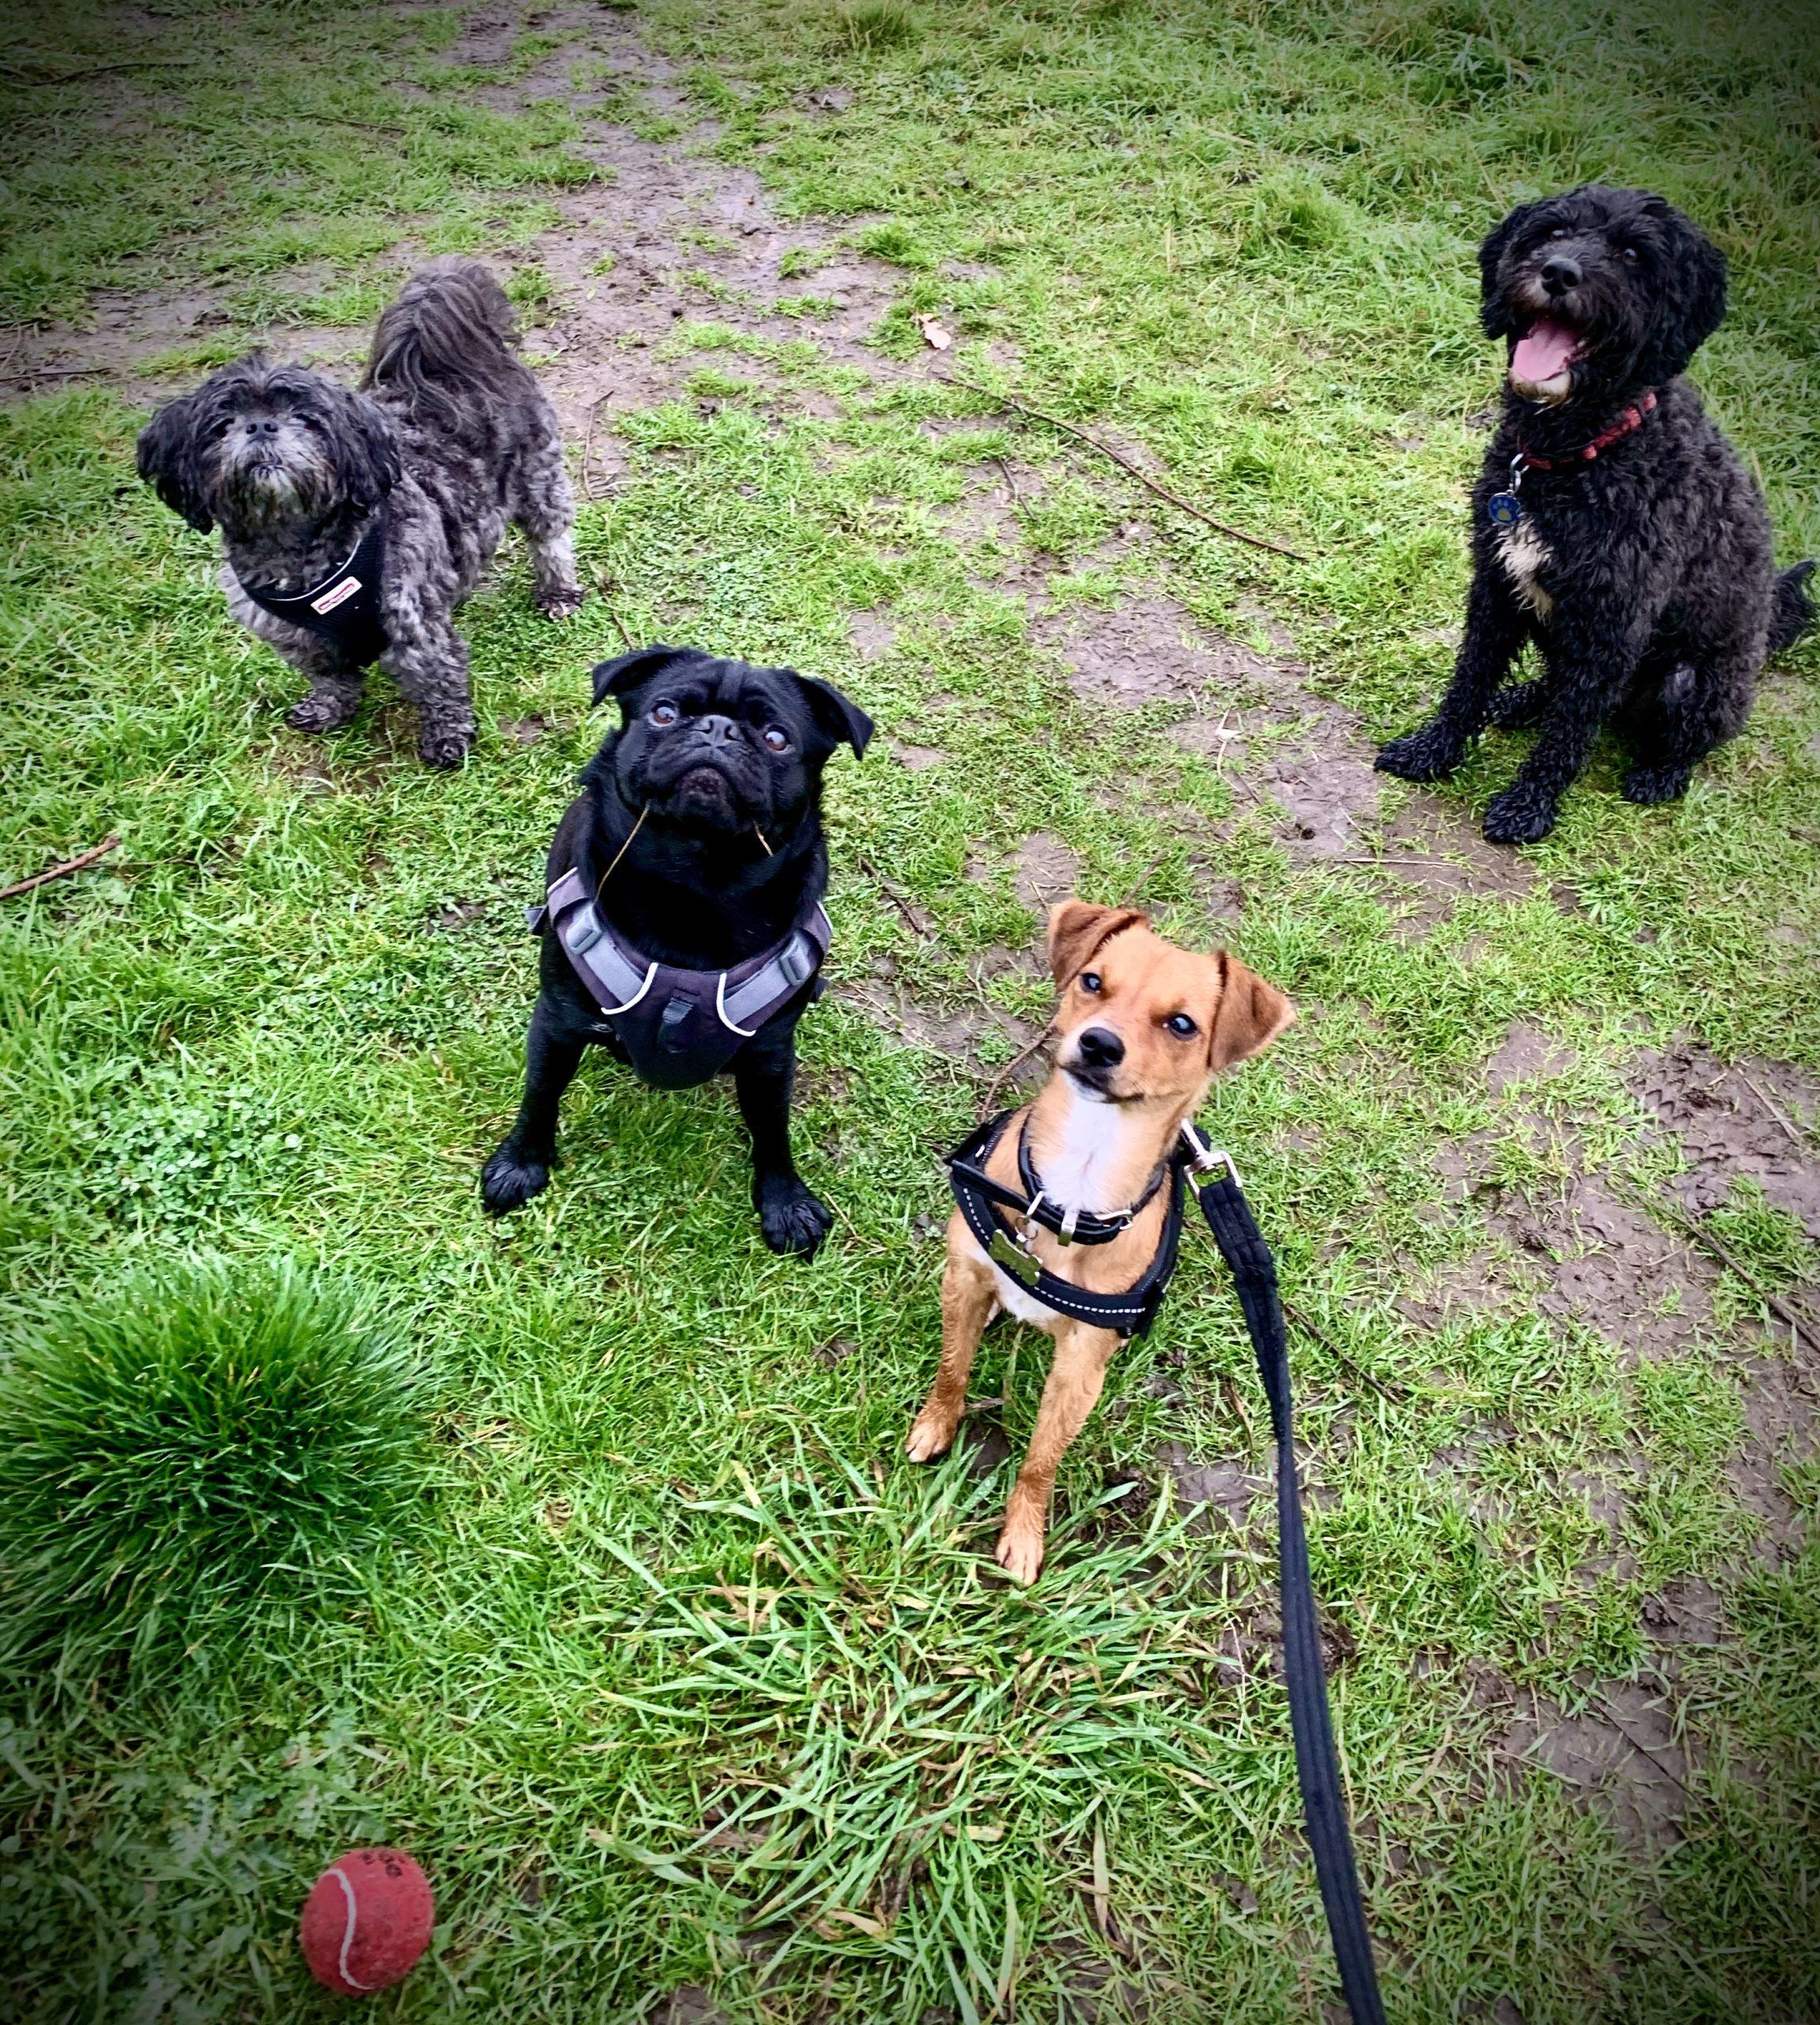 herts hiking hounds dog walking and training abbots langley kings langley hertfordshire 1